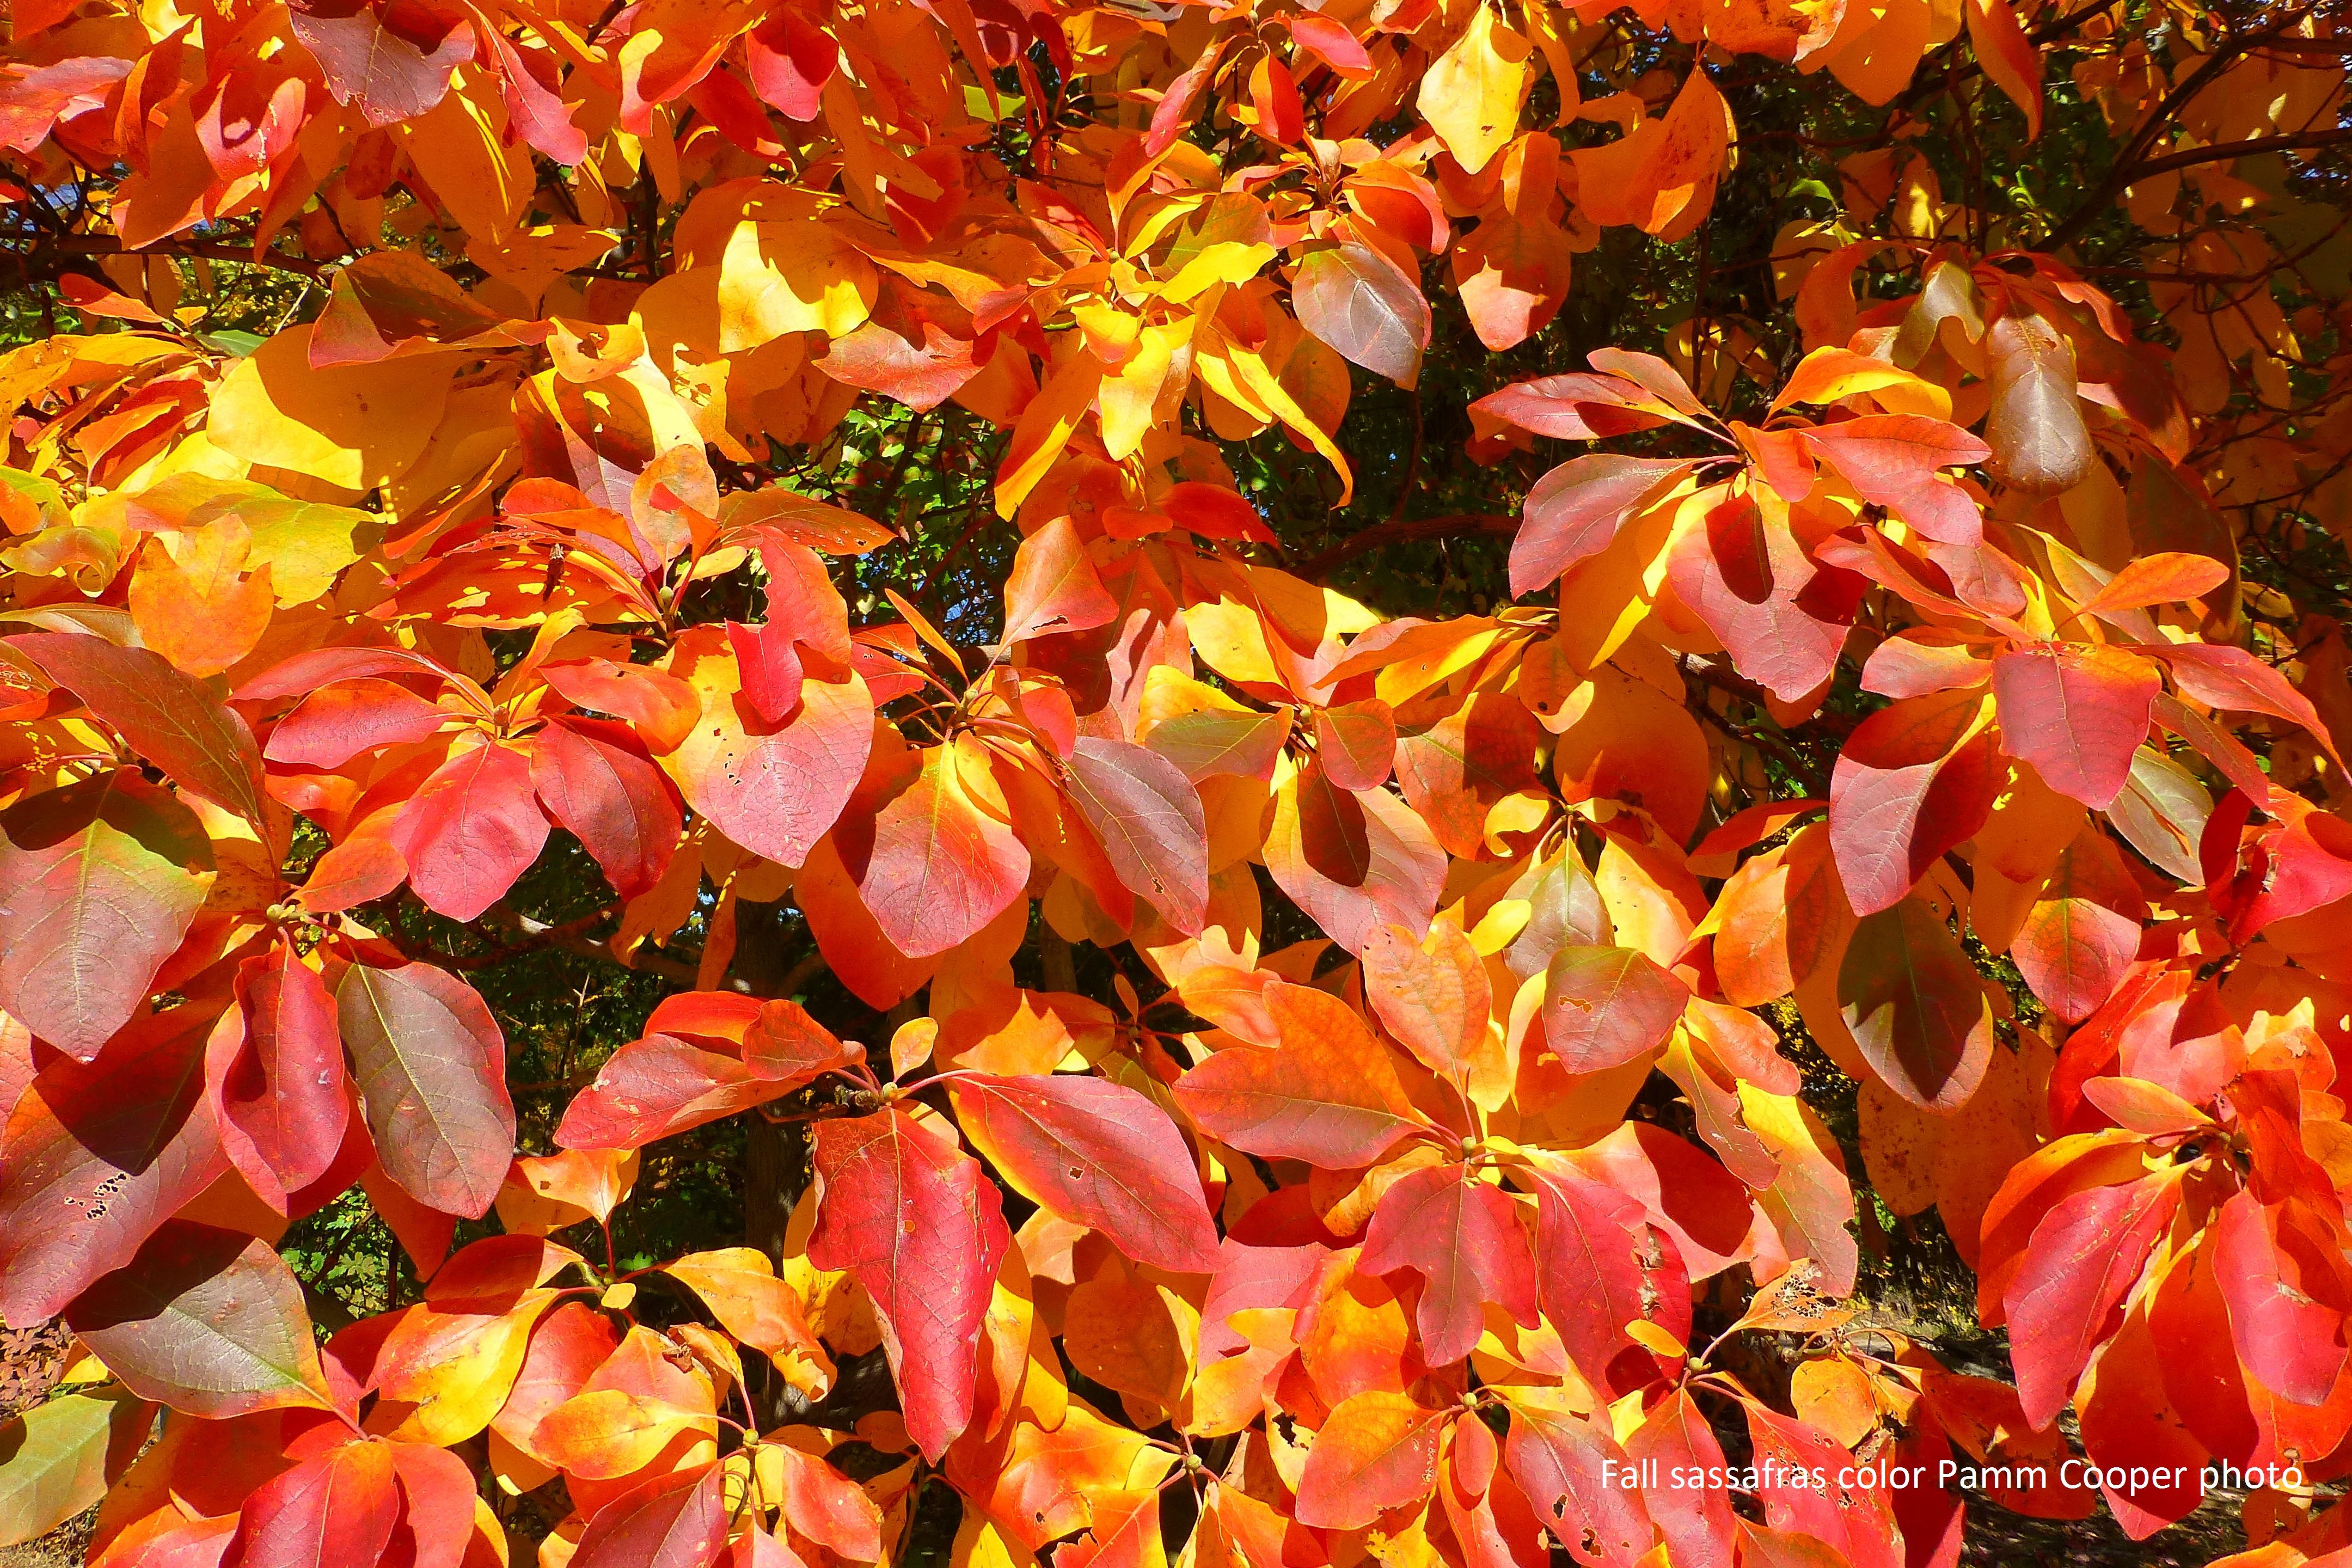 sassafras fall color